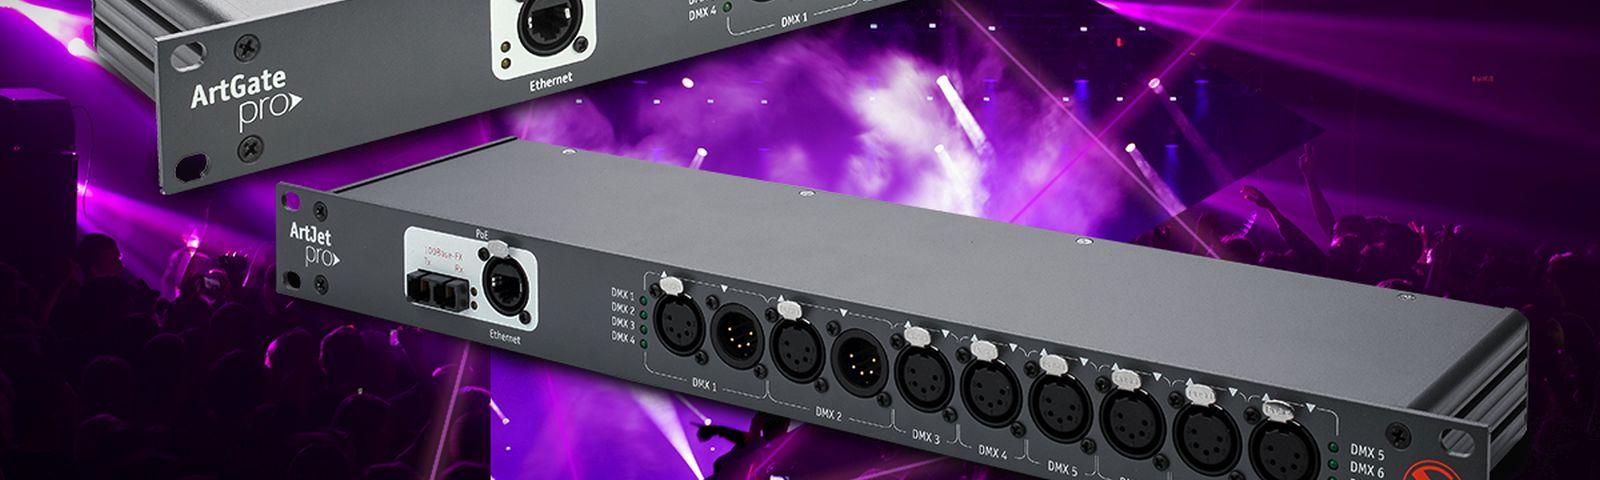 New firmware for ArtGate/ArtJet Ethernet-DMX nodes